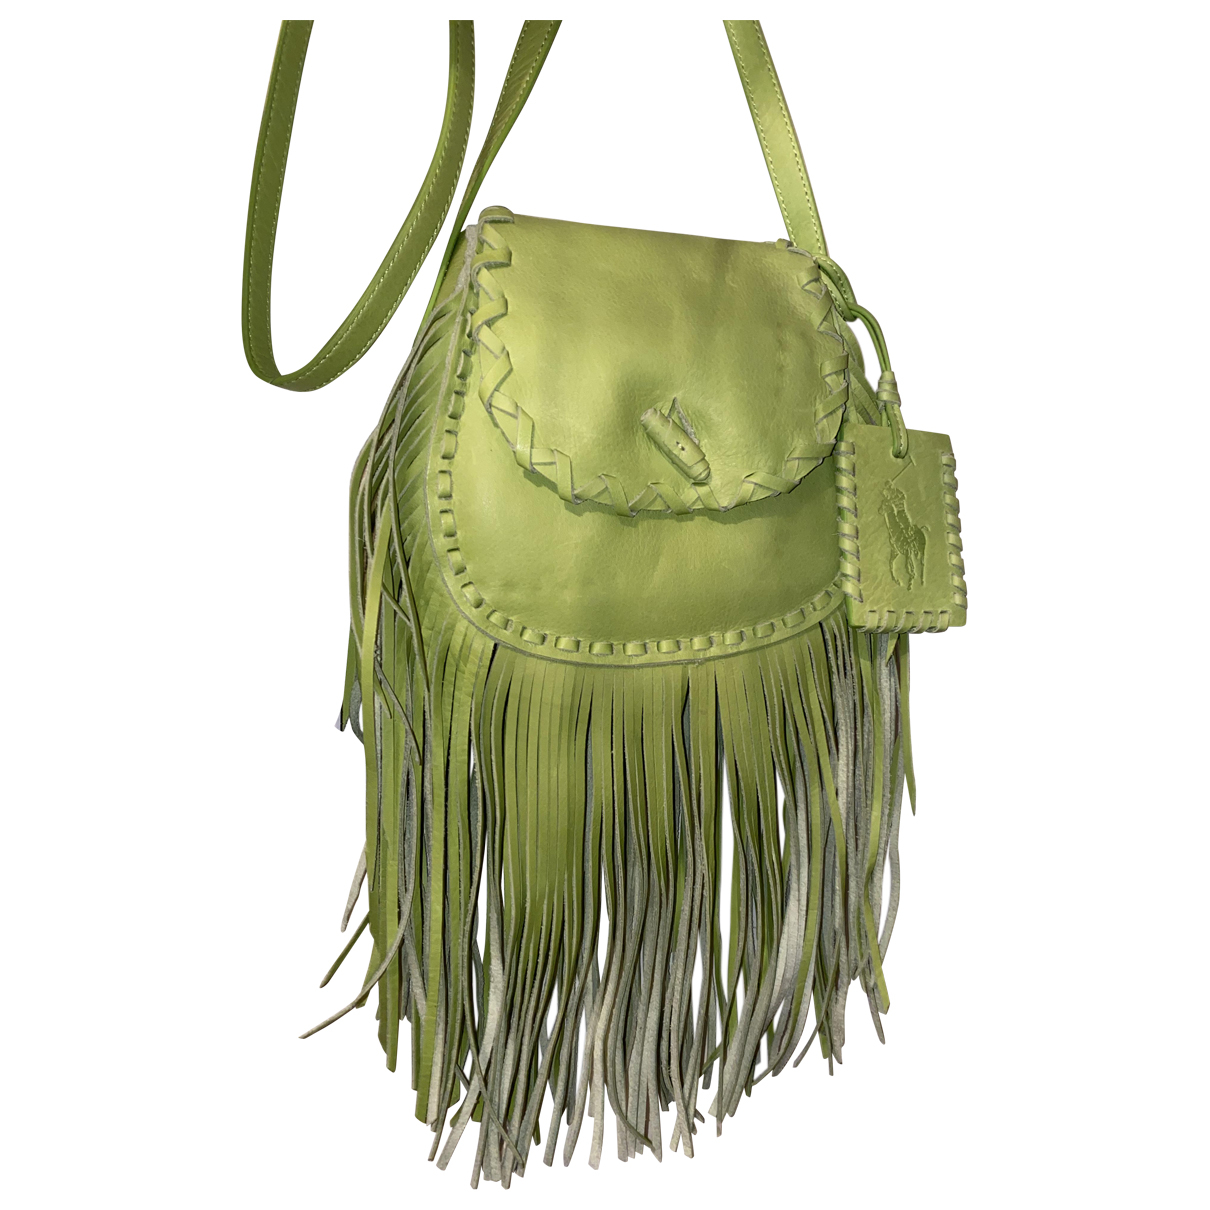 Polo Ralph Lauren \N Green Leather Clutch bag for Women \N